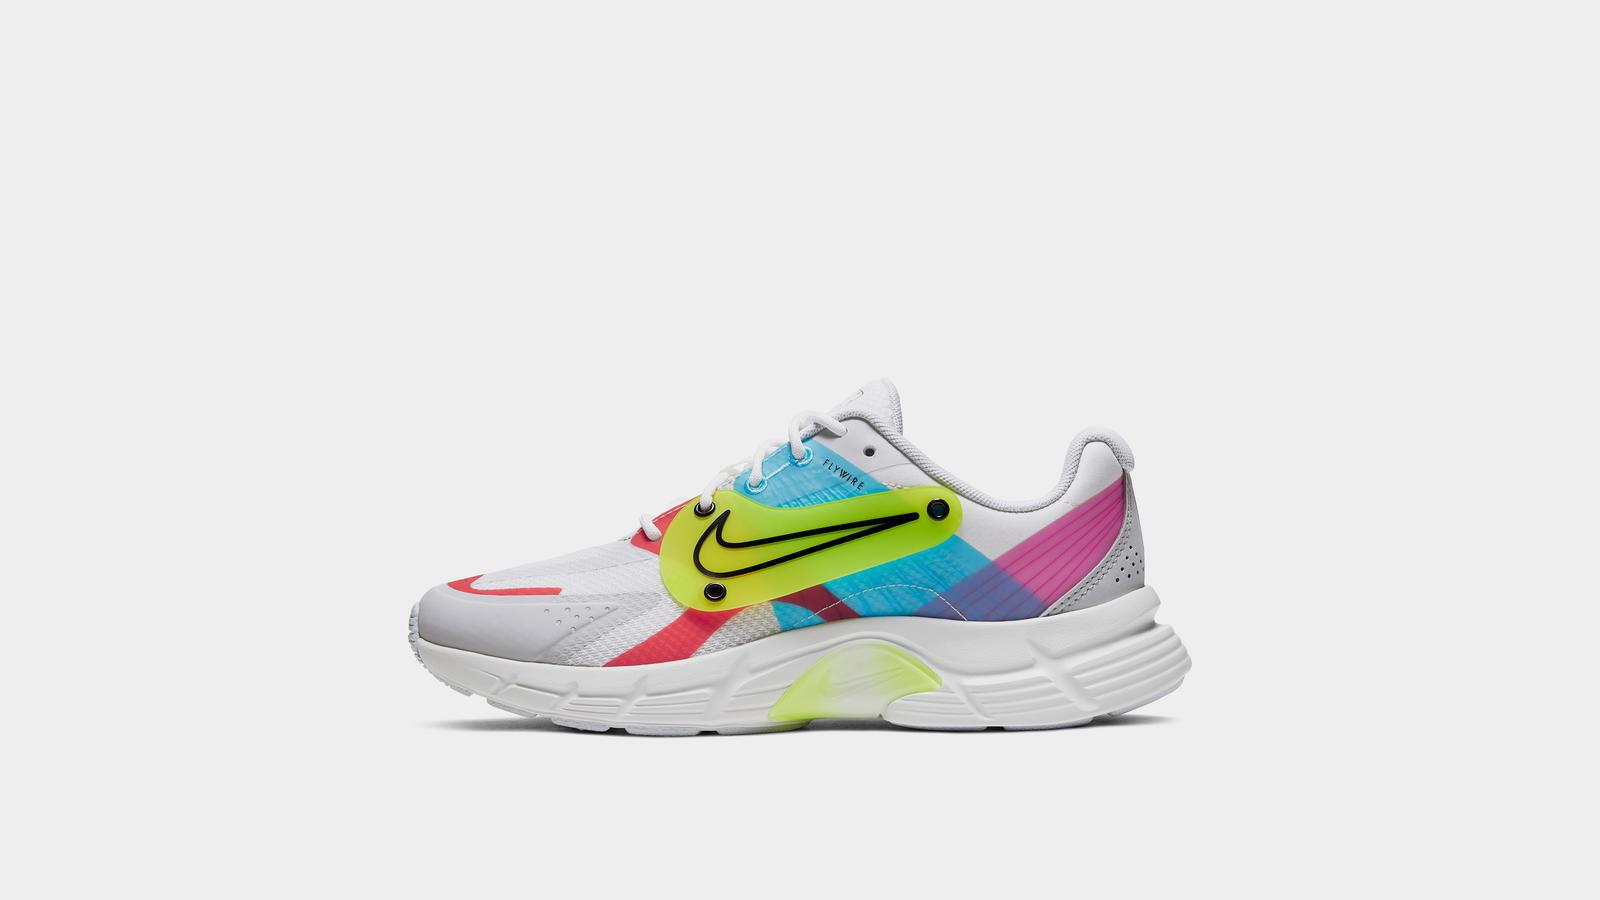 Nike Alphina 5000 9